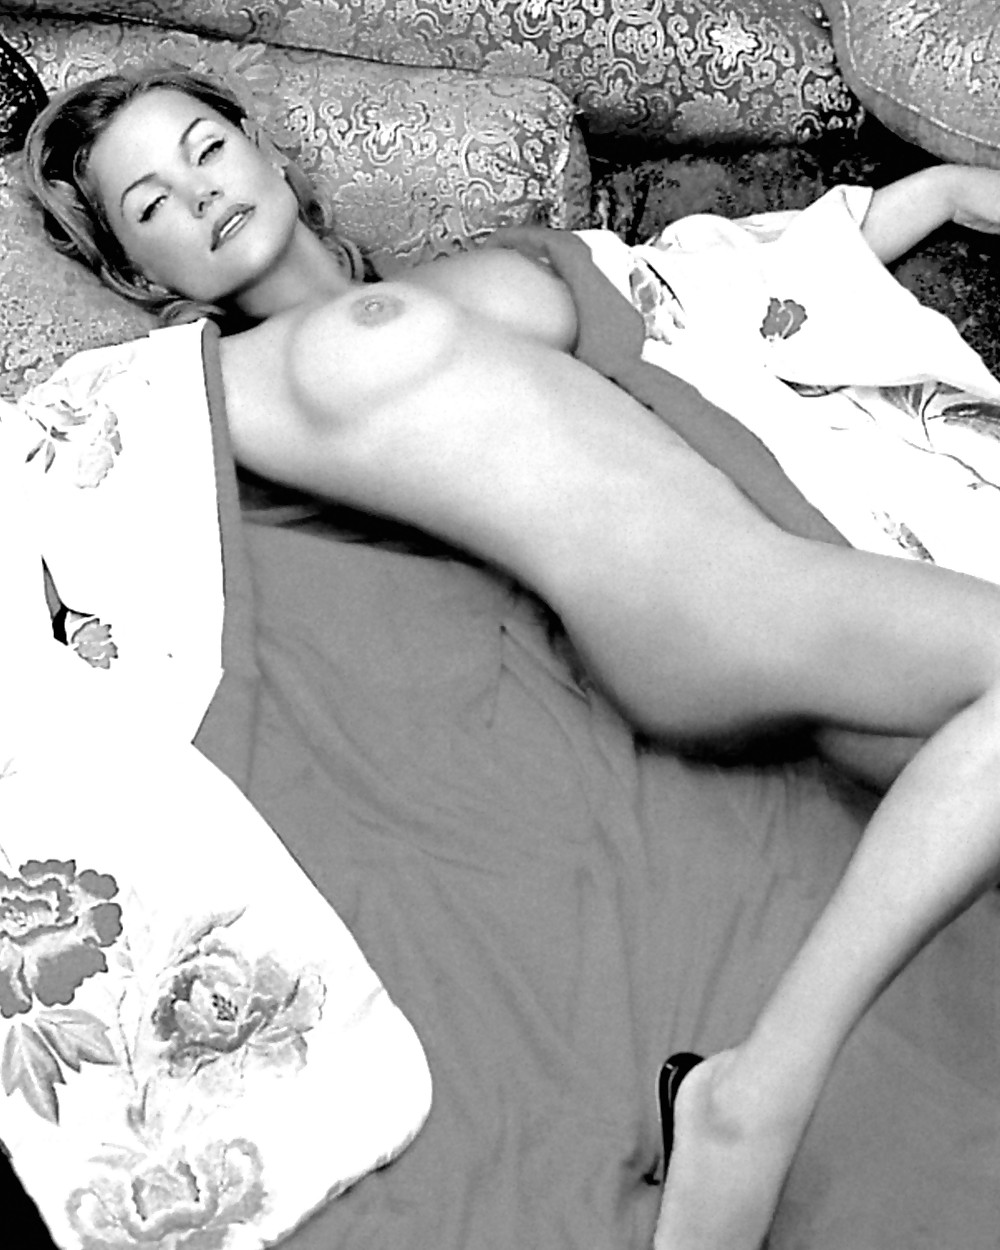 larry-belinda-carlisle-nude-pics-myles-completely